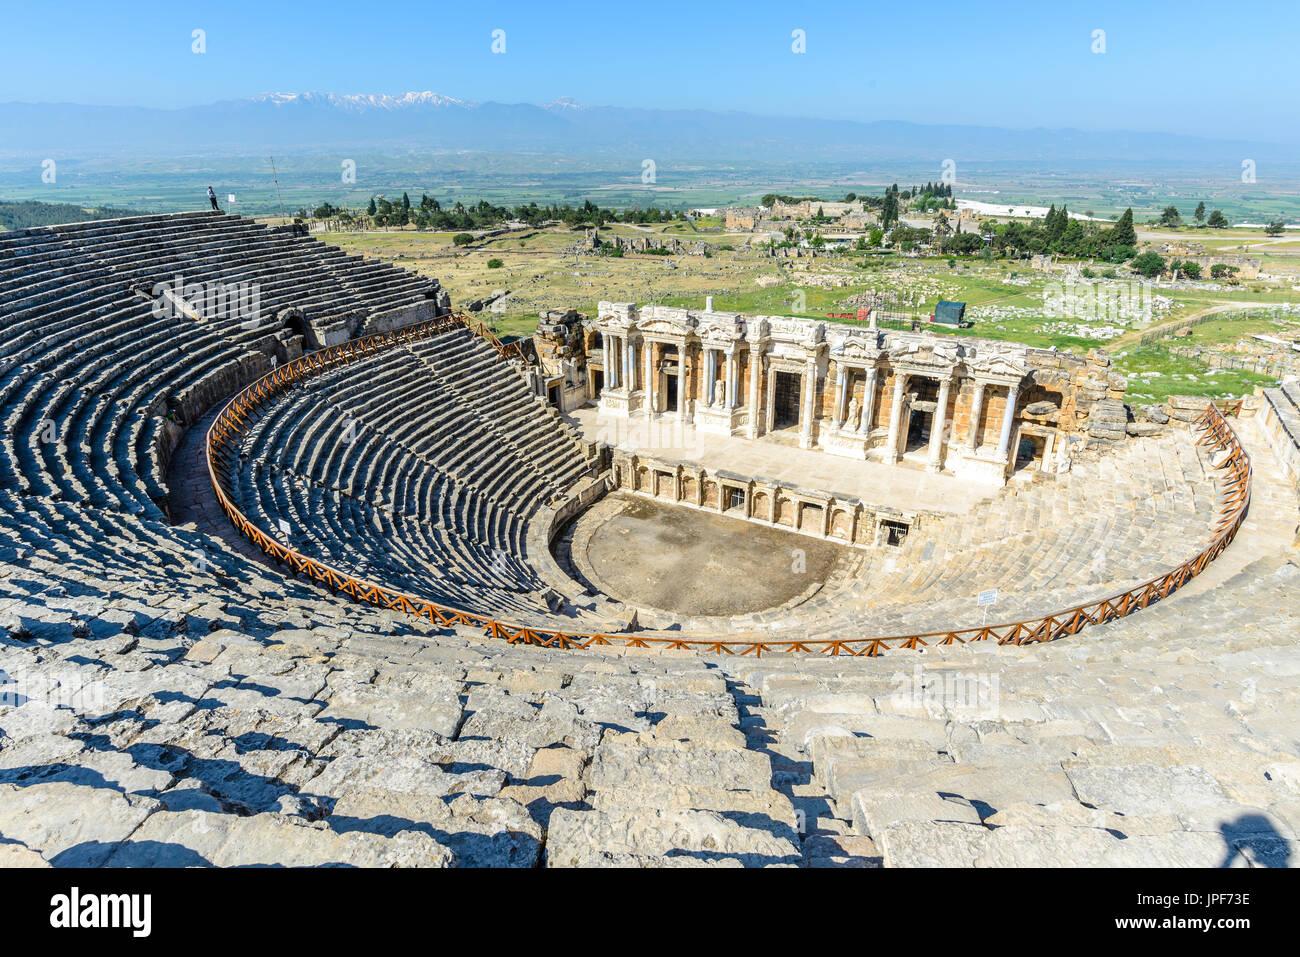 Amphitheater of Hierapolis, Turkey - Stock Image